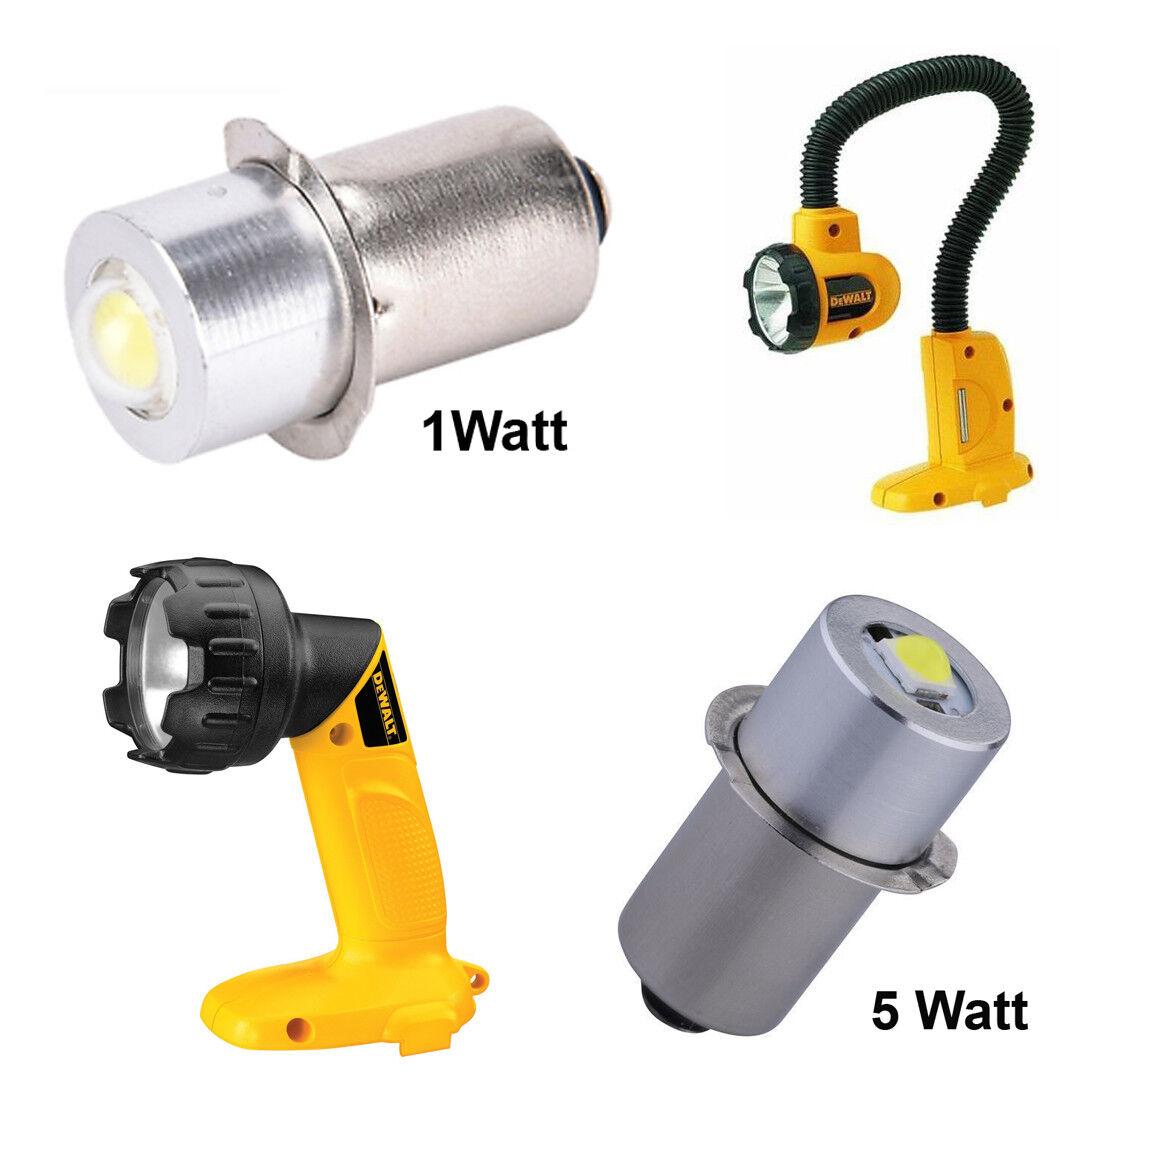 18V LED Replacement Bulb for Dewalt DW908, DW919 P13.5S Size